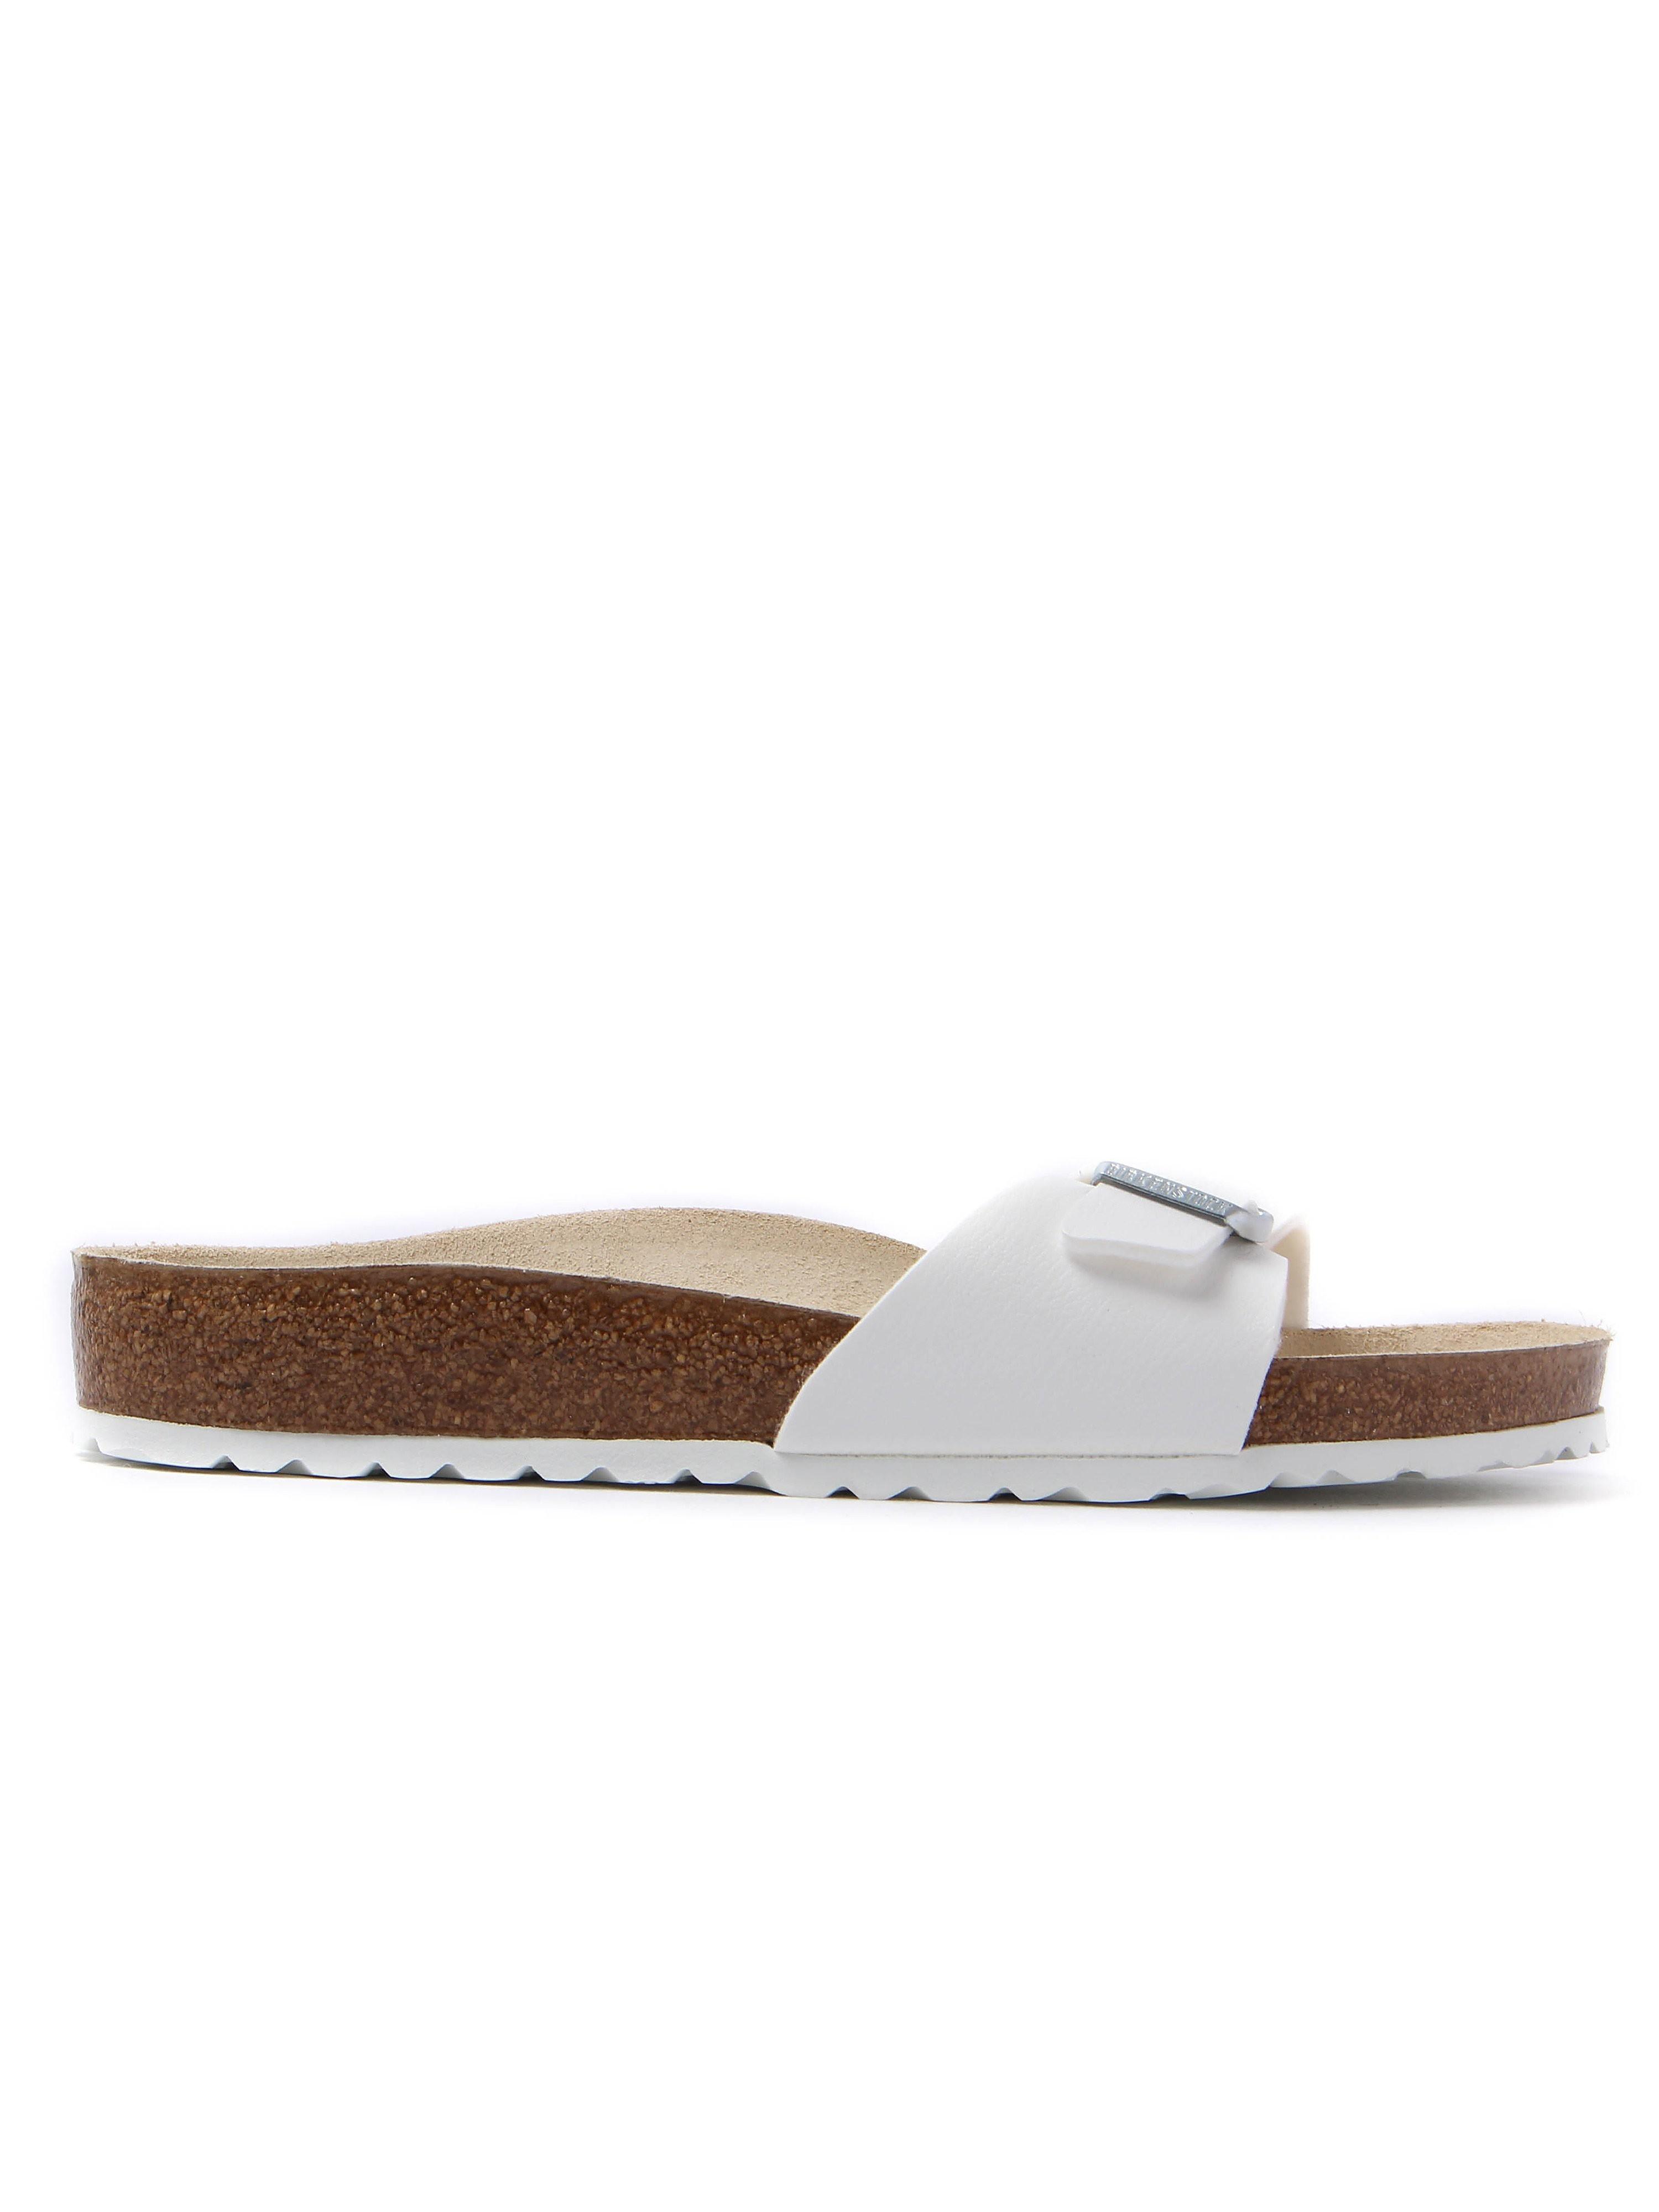 Birkenstock Women's Madrid Single Strap Sandals - White Leather